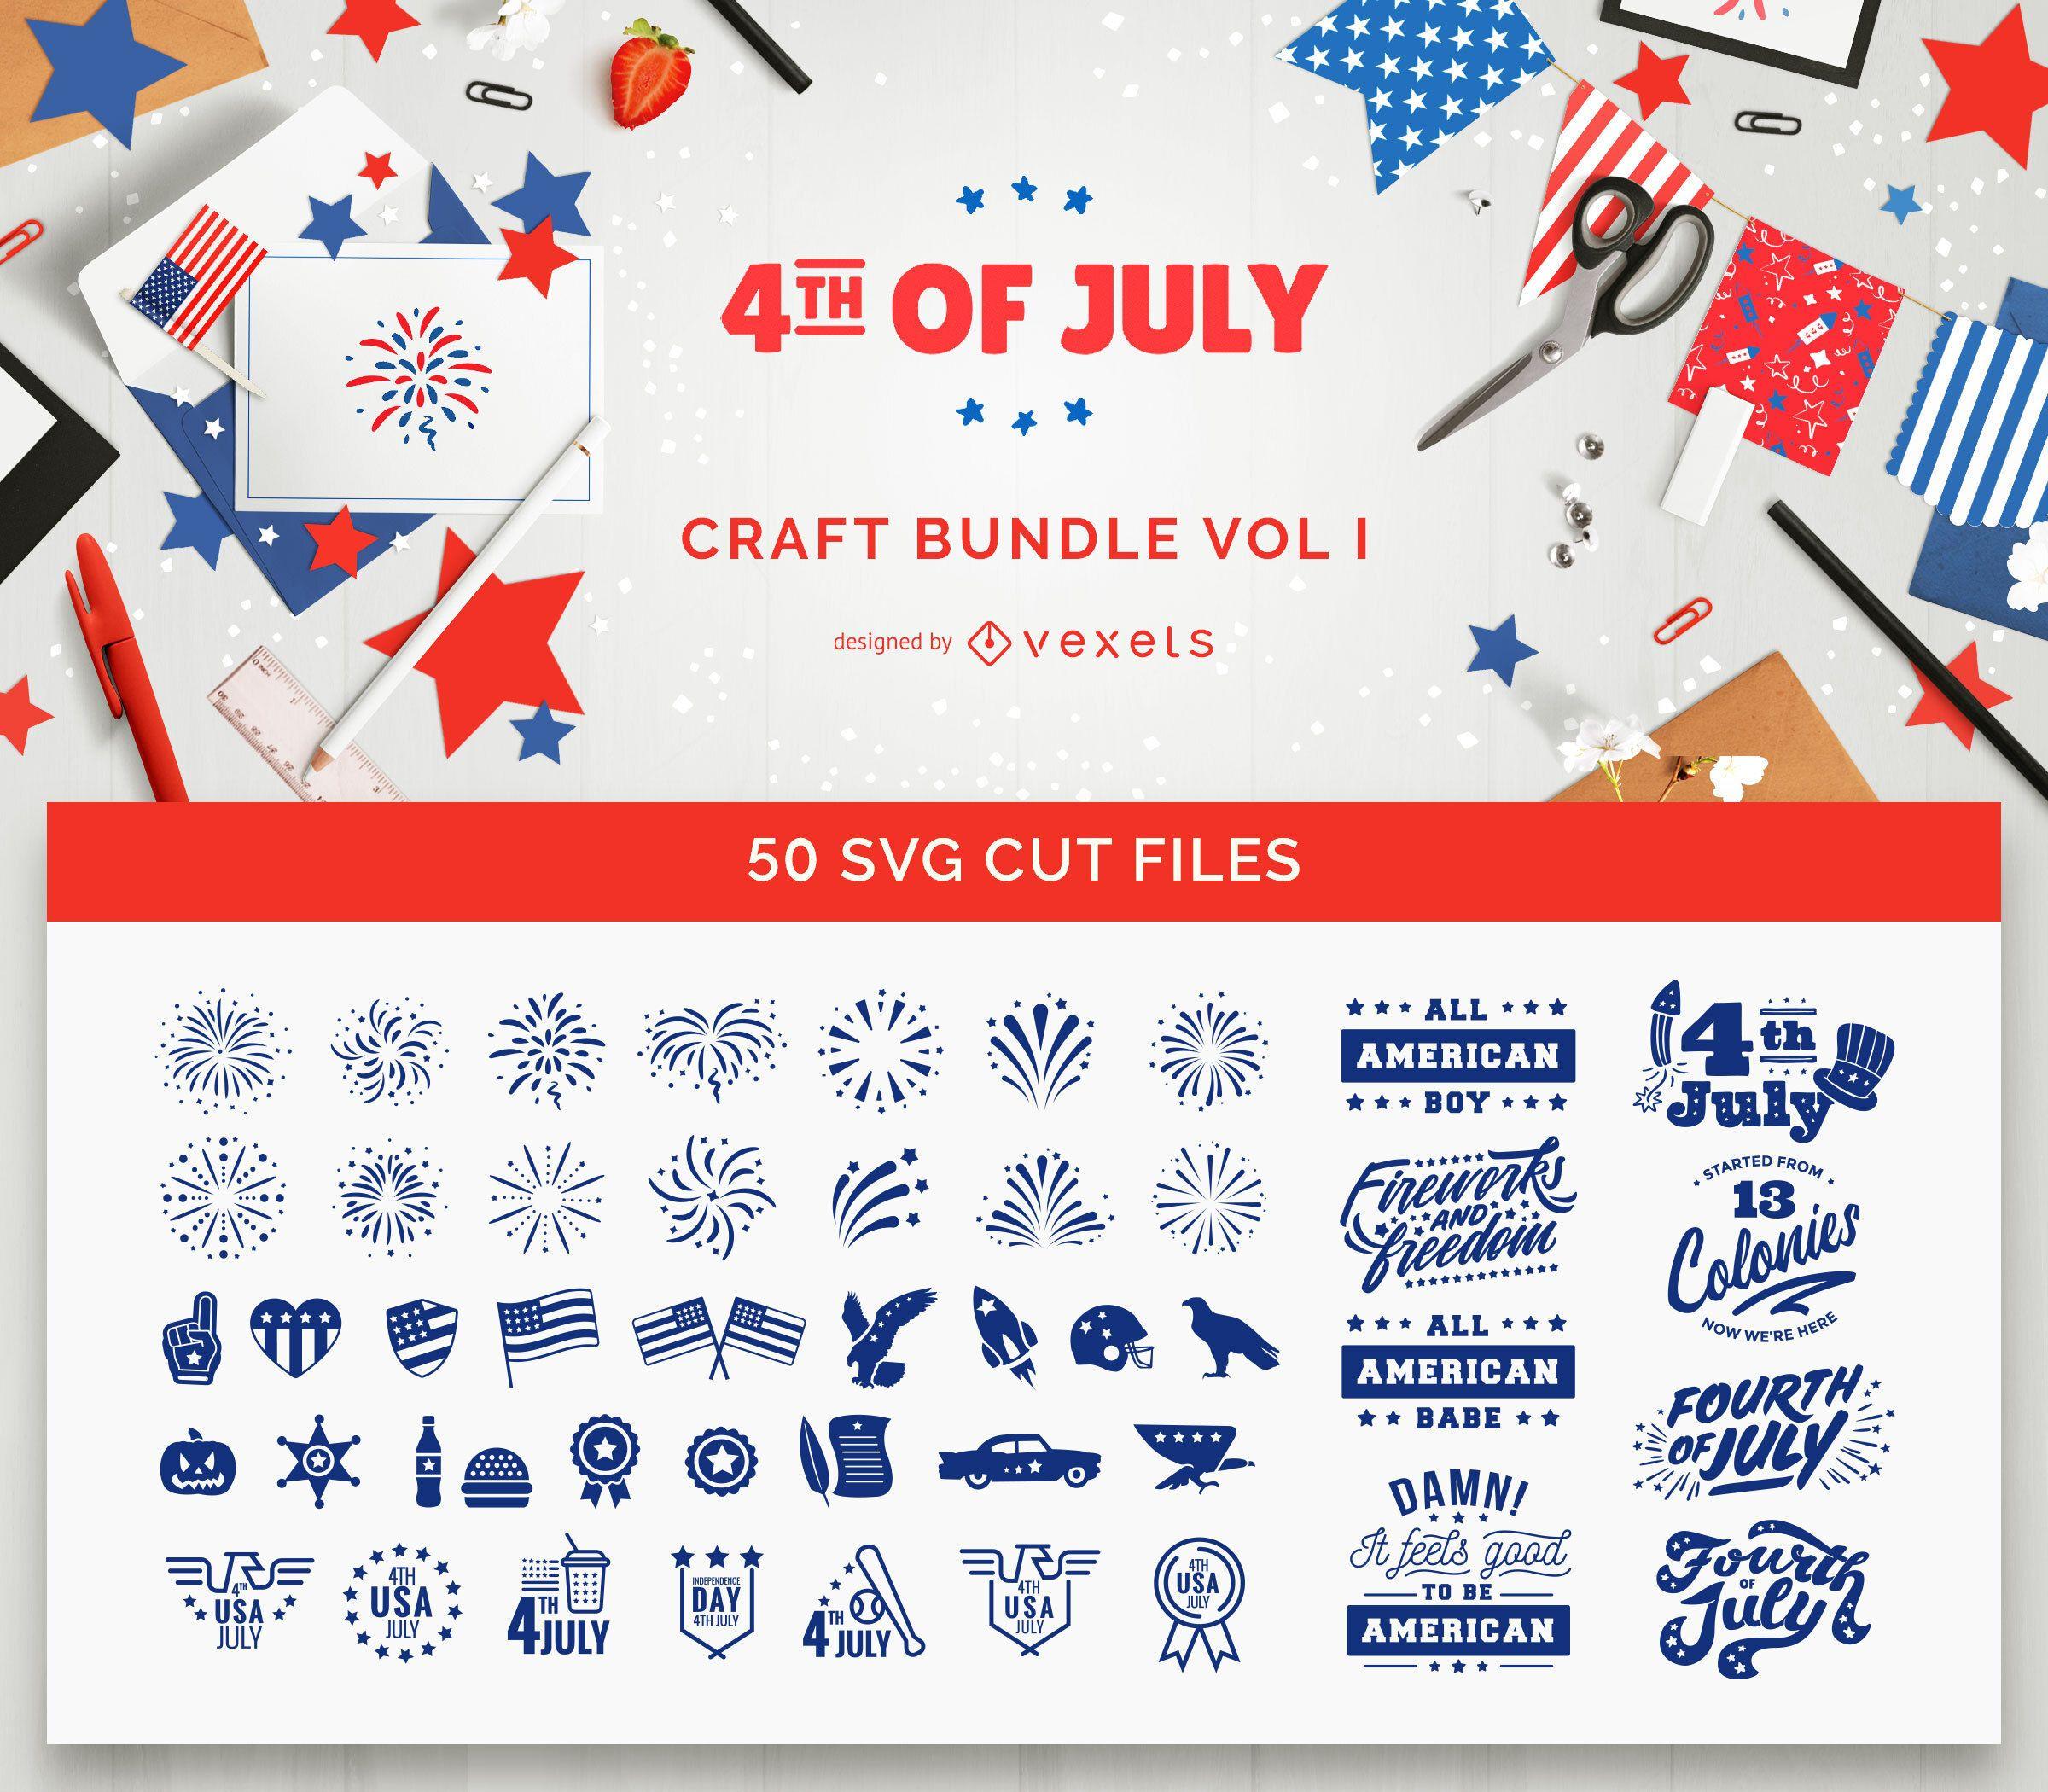 Paquete de manualidades del 4 de julio Vol I